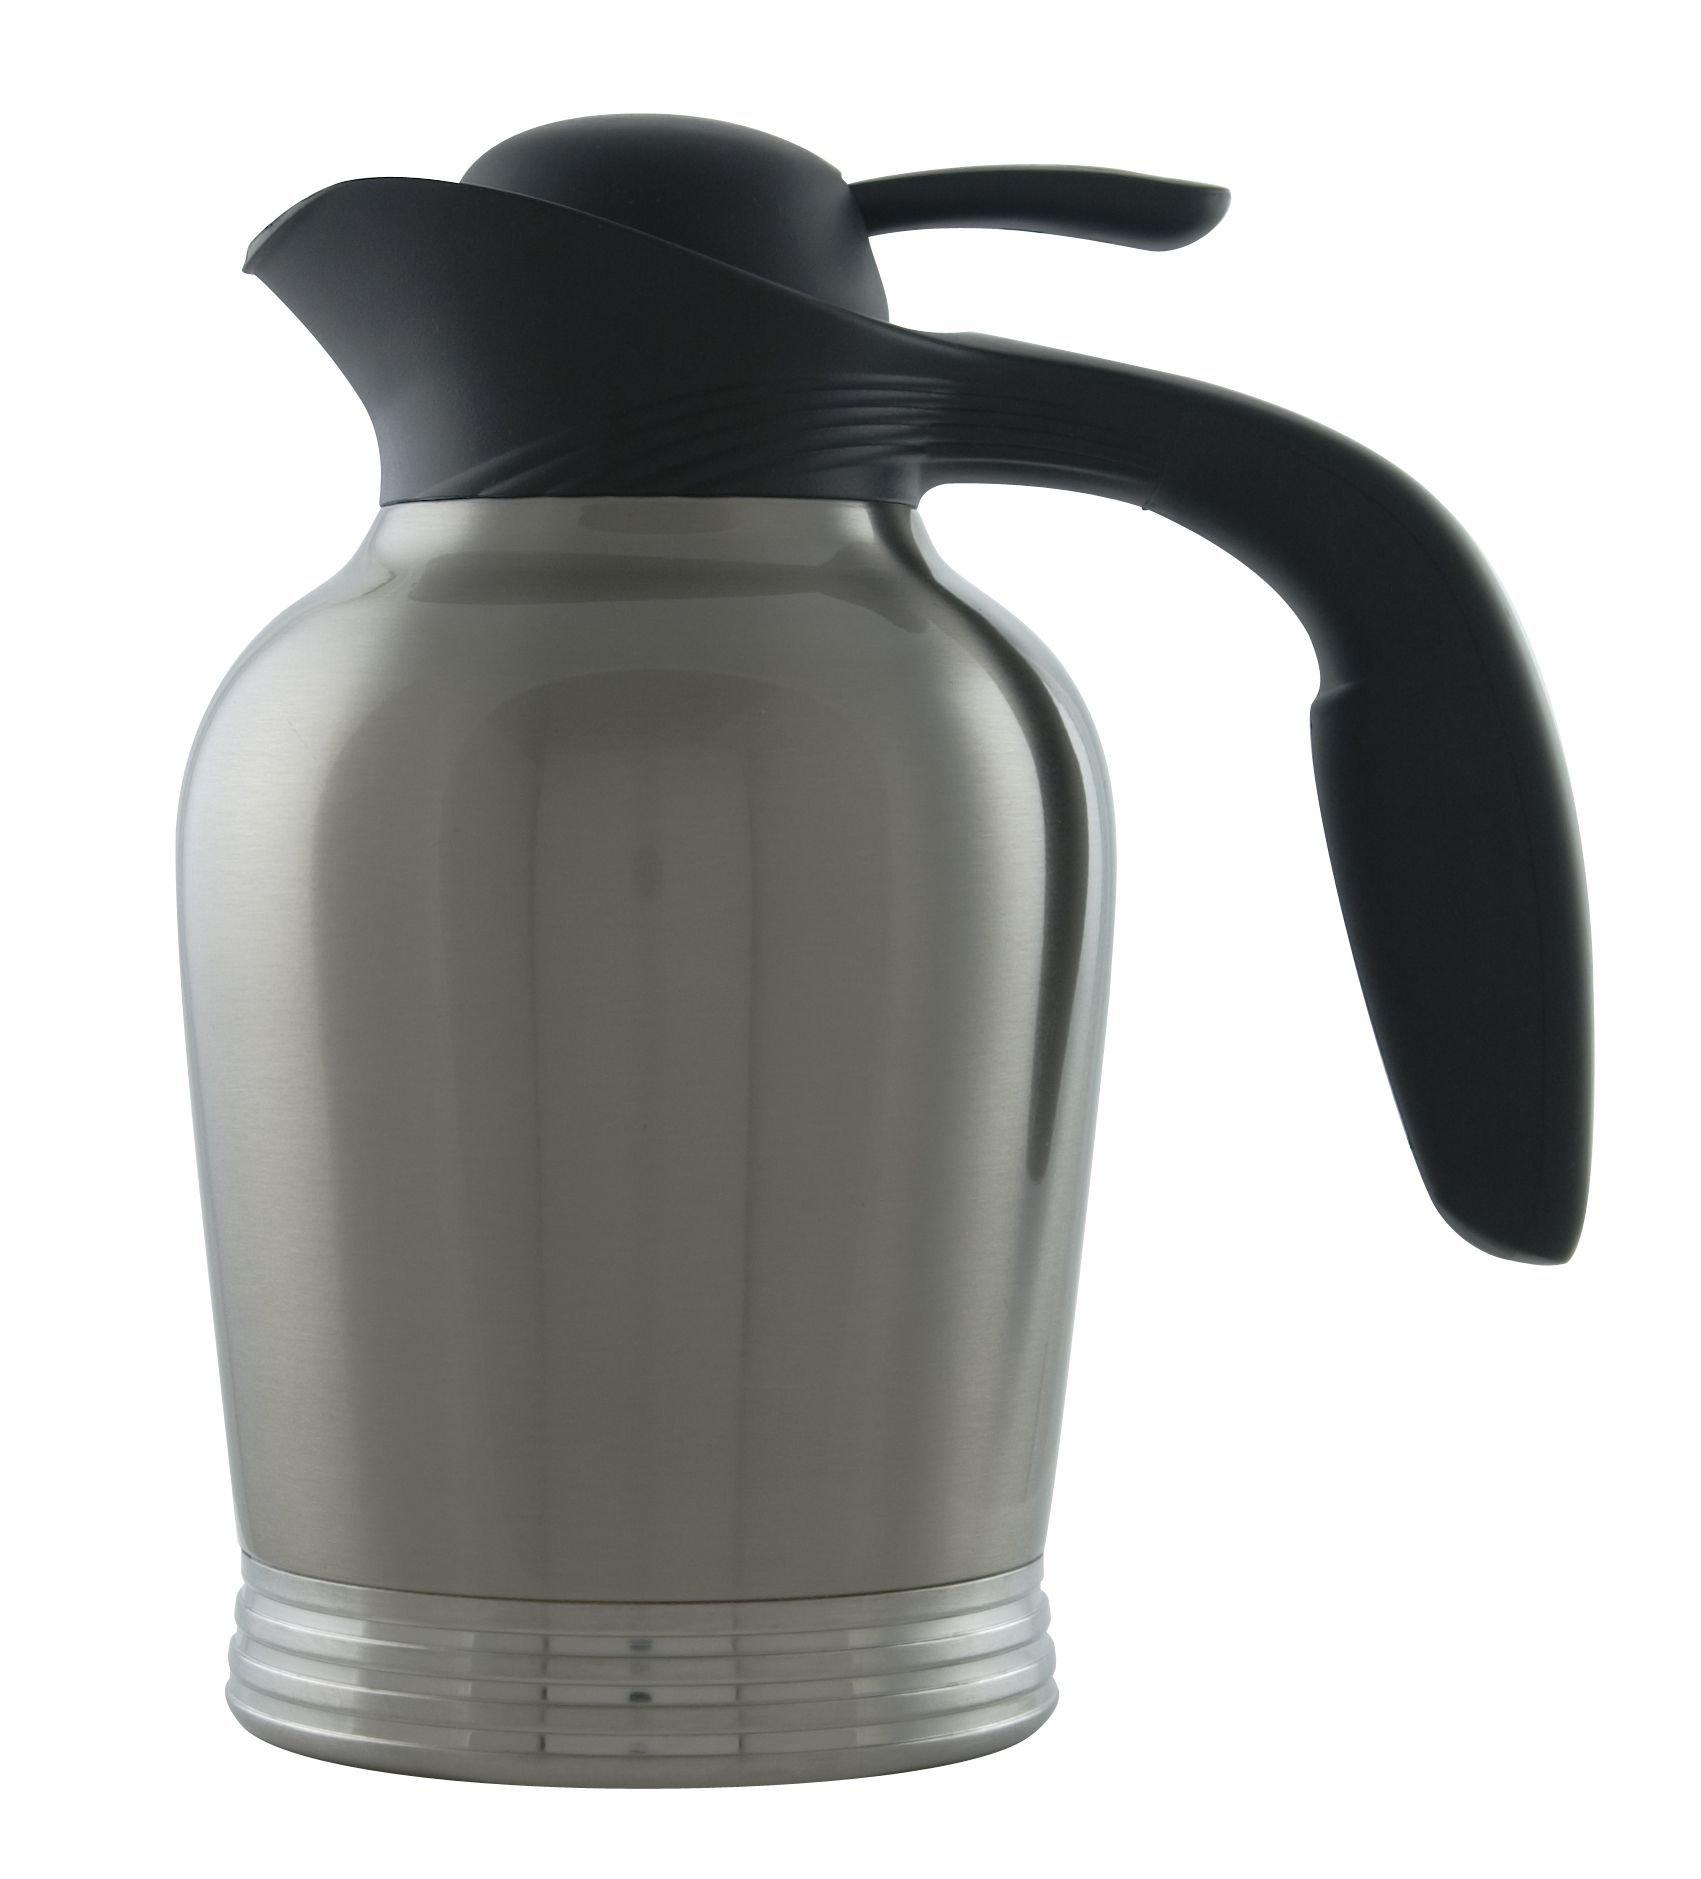 Stanley Commercial 10-00008-000 ErgoServ Carafe, 1.5 Liter (50.7 oz.), Brushed Stainless/Black